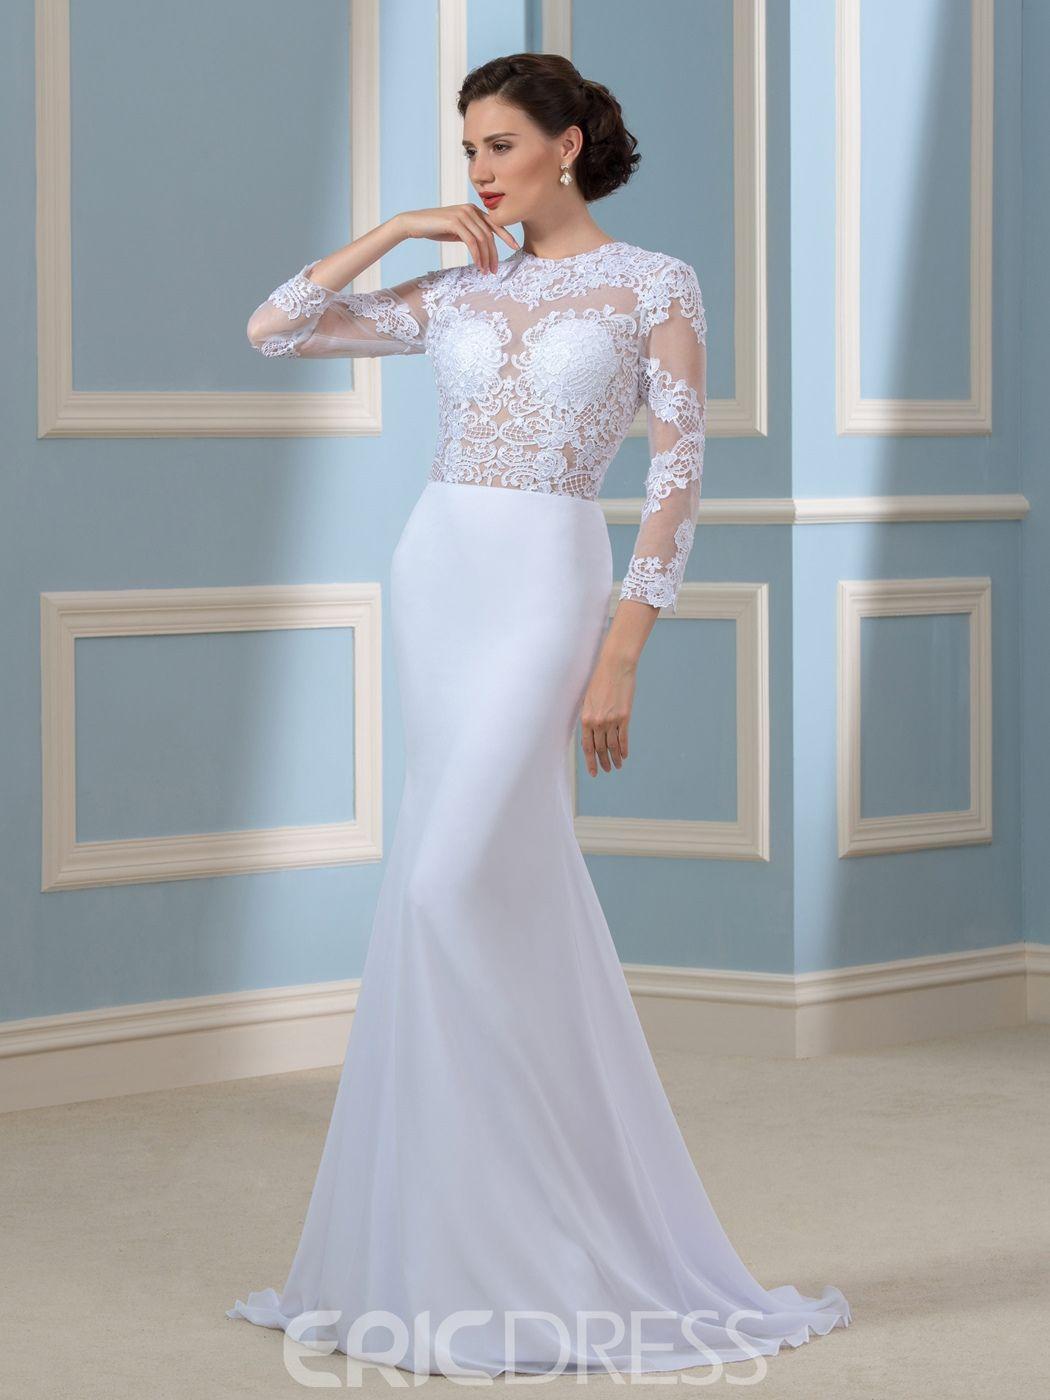 99+ Mermaid Wedding Dress with Sleeves - Best Shapewear for Wedding ...